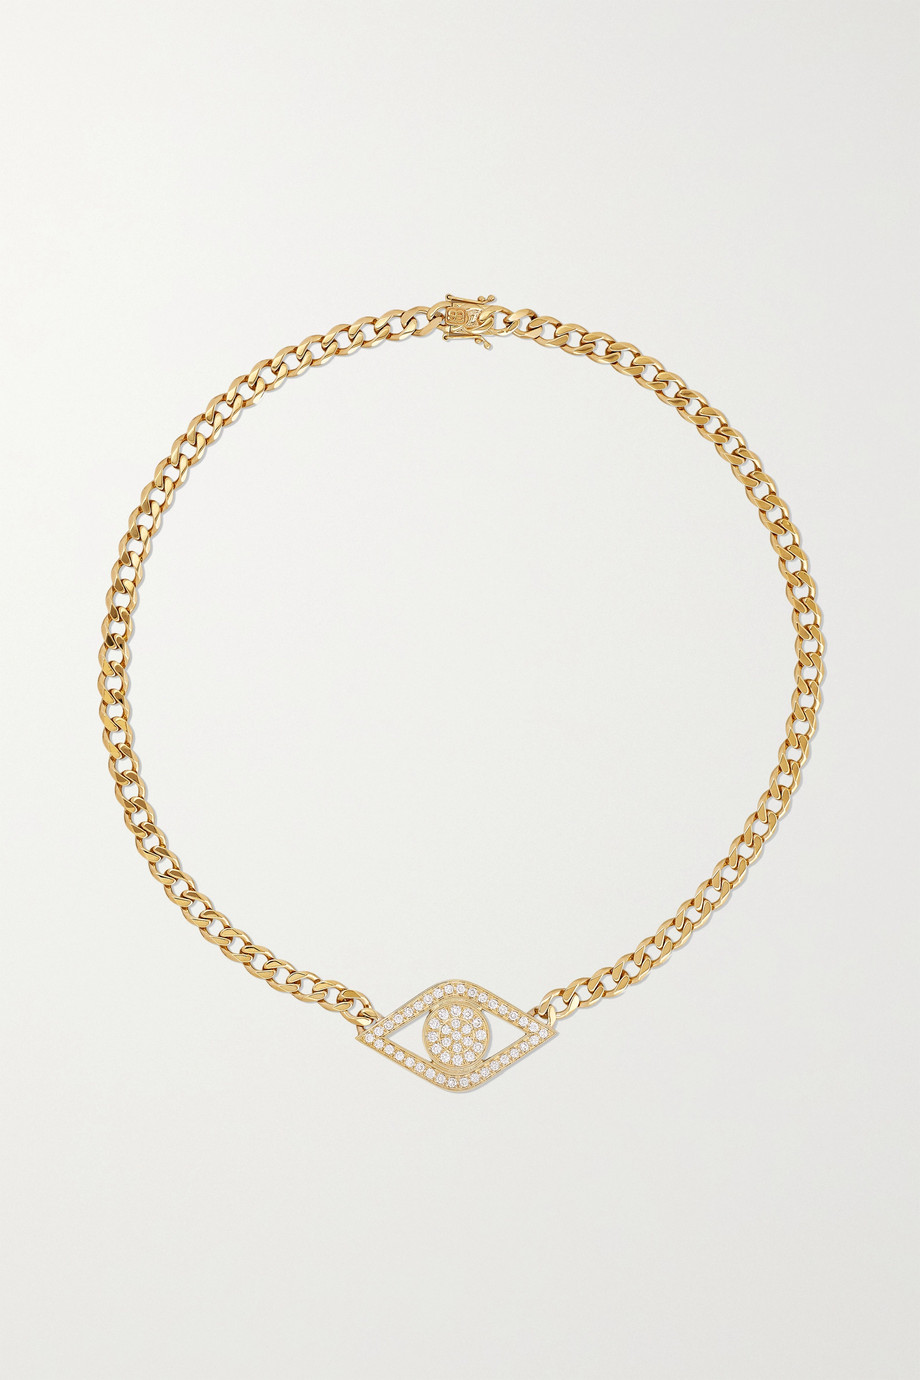 Sydney Evan Evil Eye 14-karat gold diamond necklace